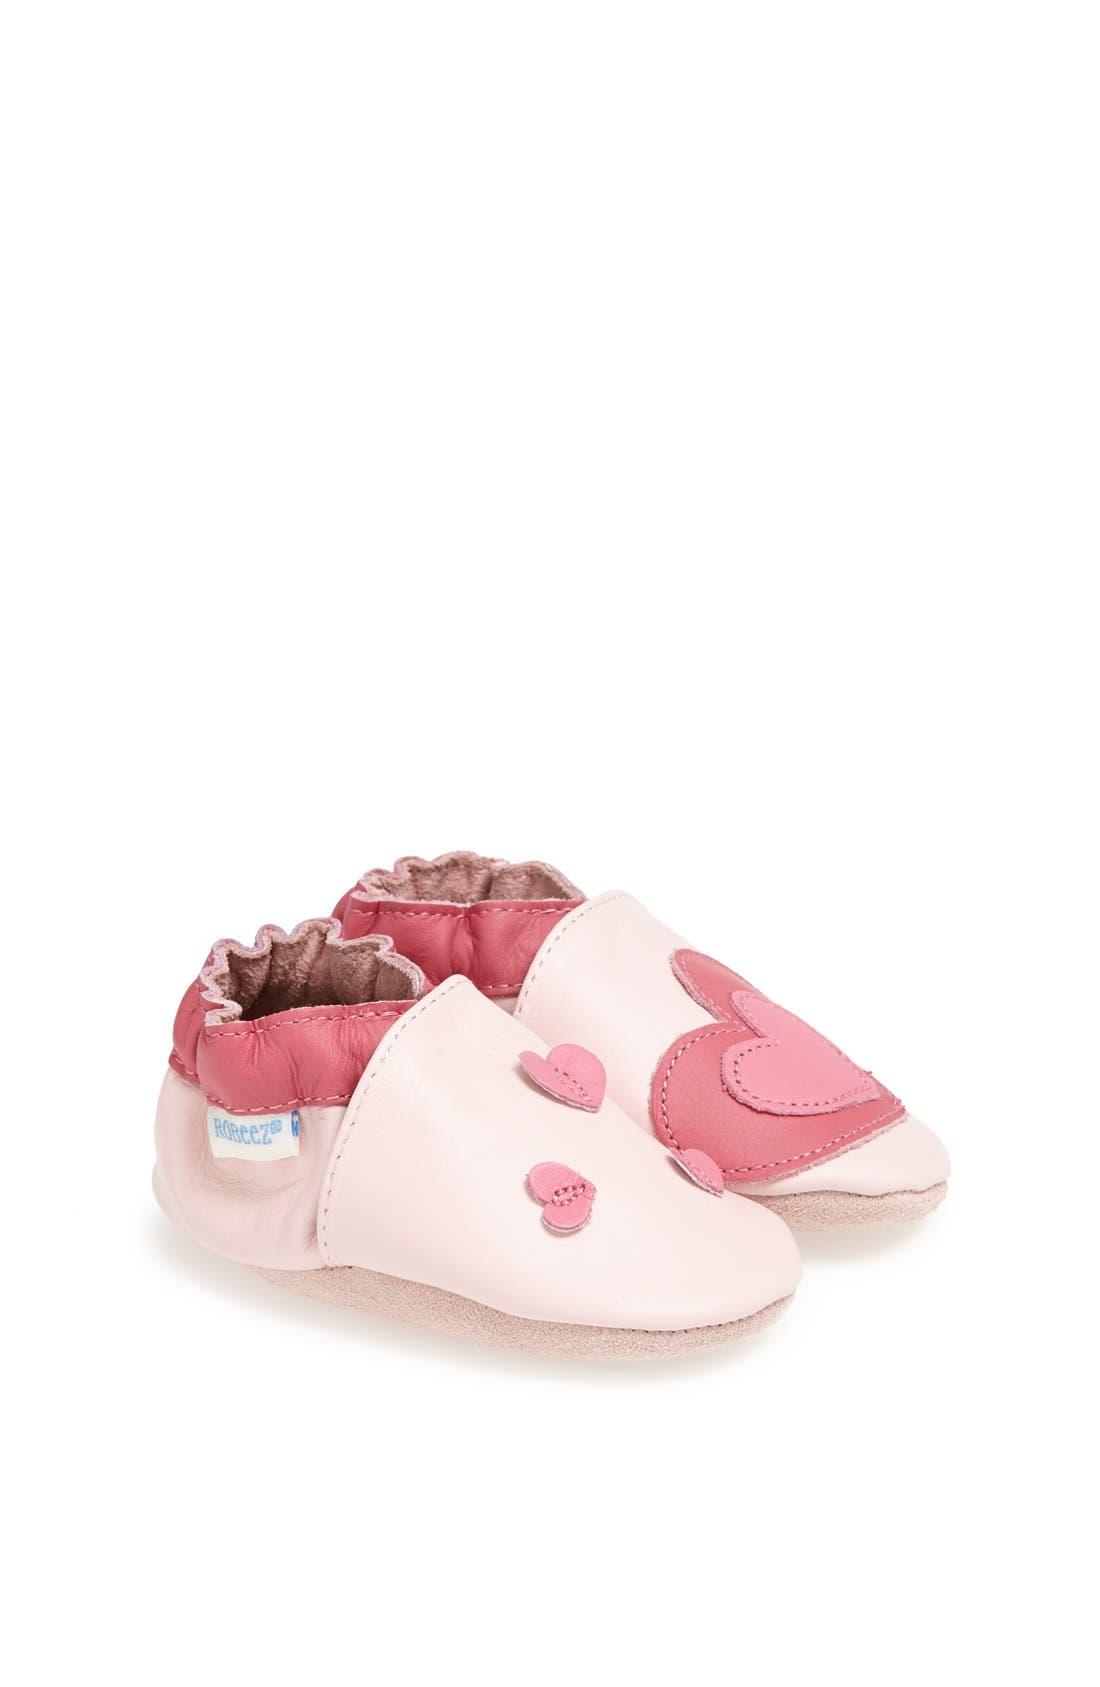 'Sweet Heart' Crib Shoe,                             Main thumbnail 1, color,                             Pink